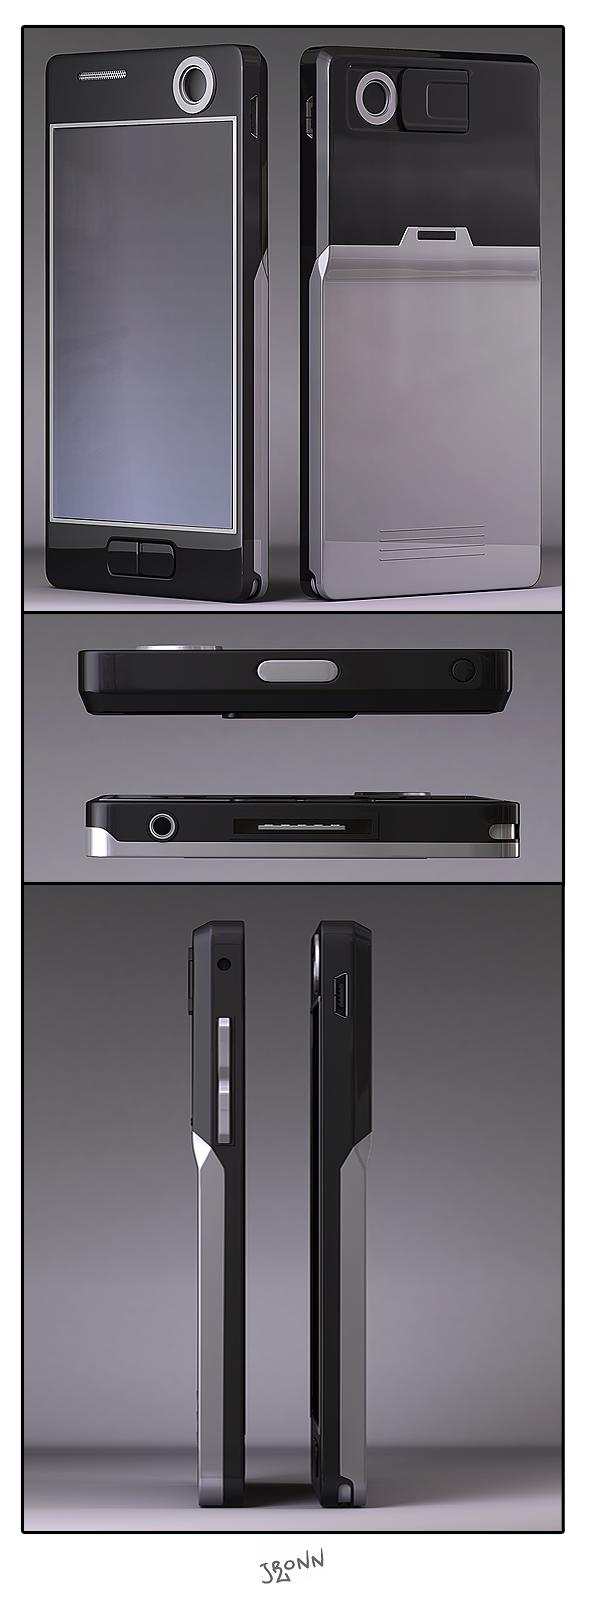 3DOcean Cellphone Generic 01 3985629